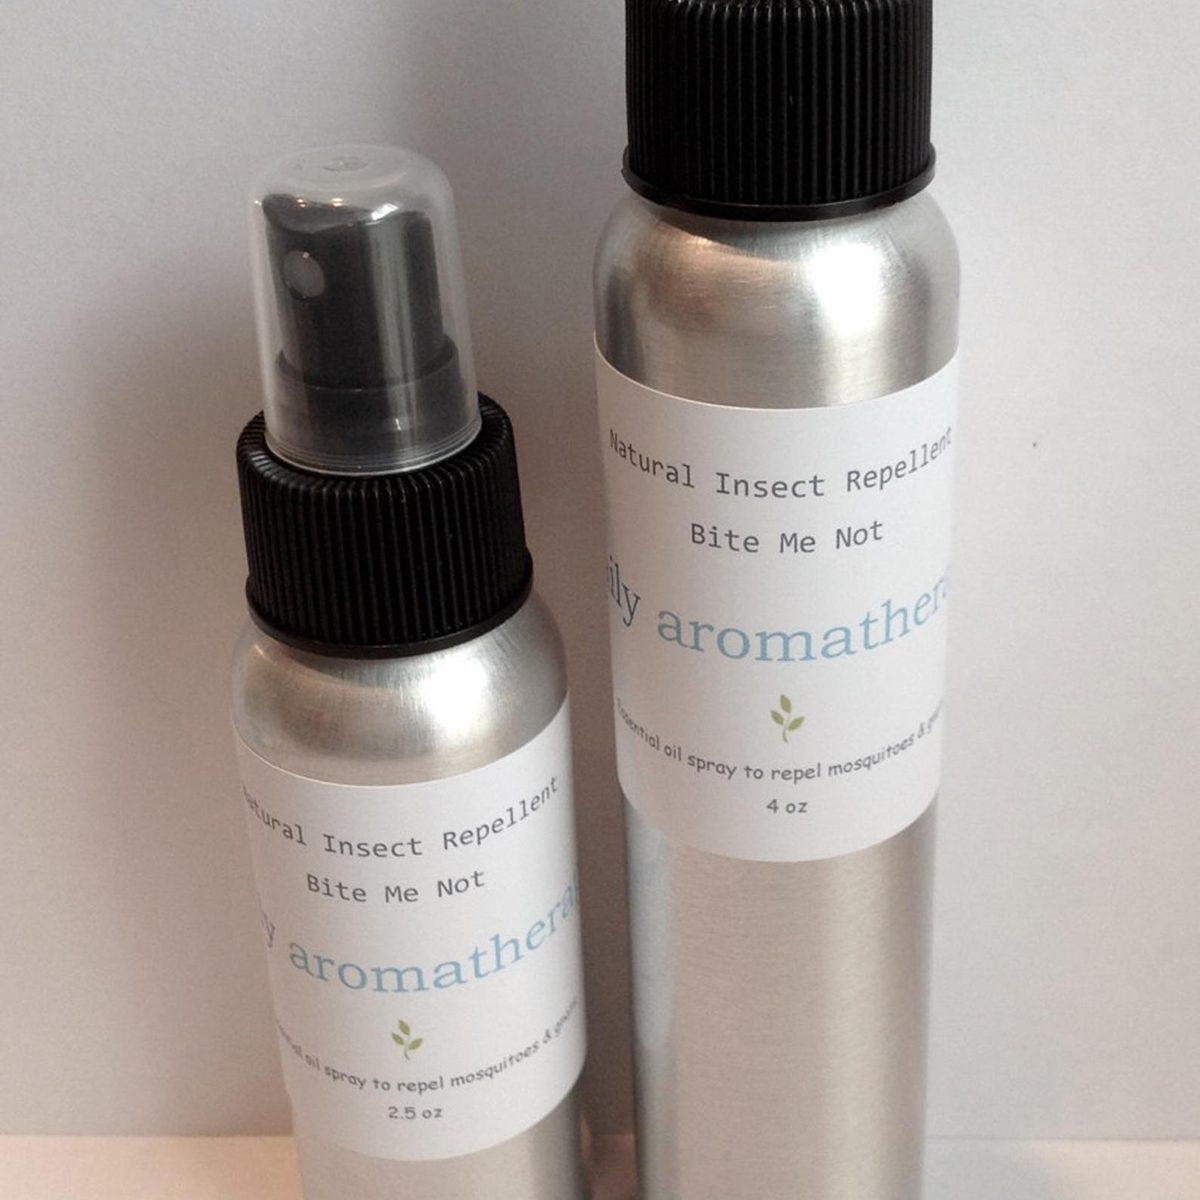 Bite Me Not -- Cinnamon Scented Natural Insect Repellent -- Cedarwood, Lemongrass, Citronella, Cinnamon Bark, Eucalyptus